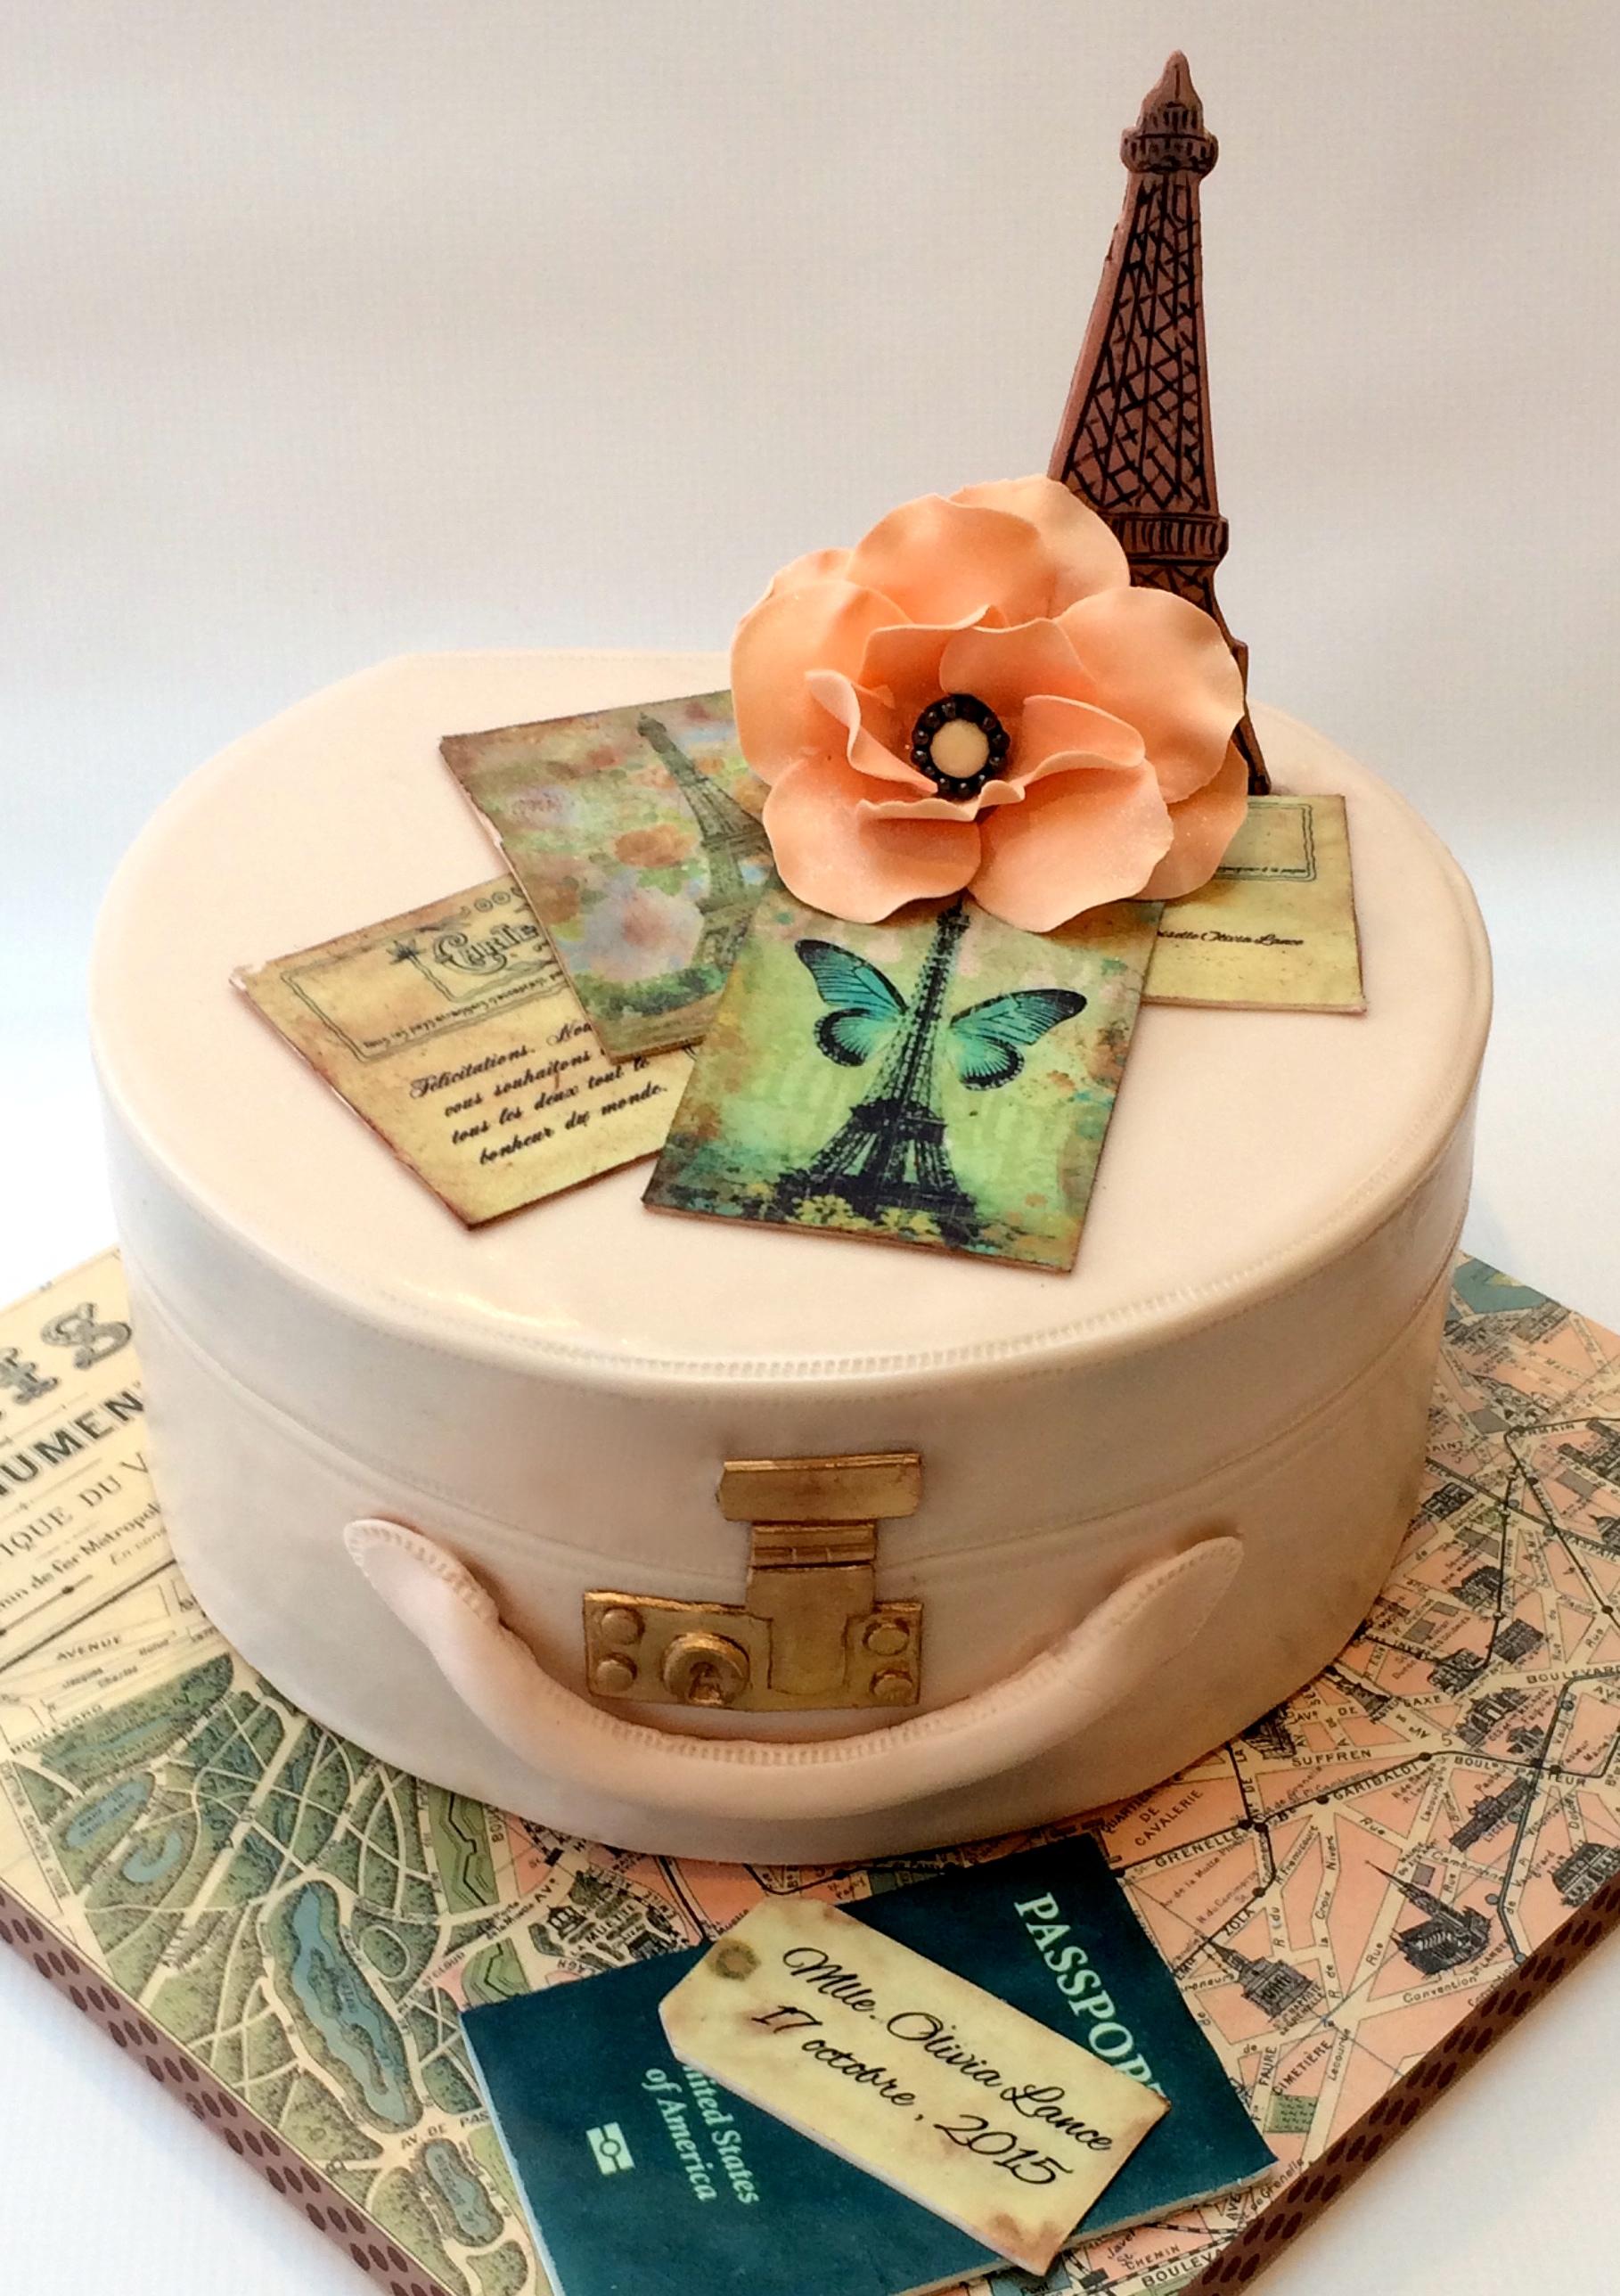 Paris-themed bridal shower/engagement cake